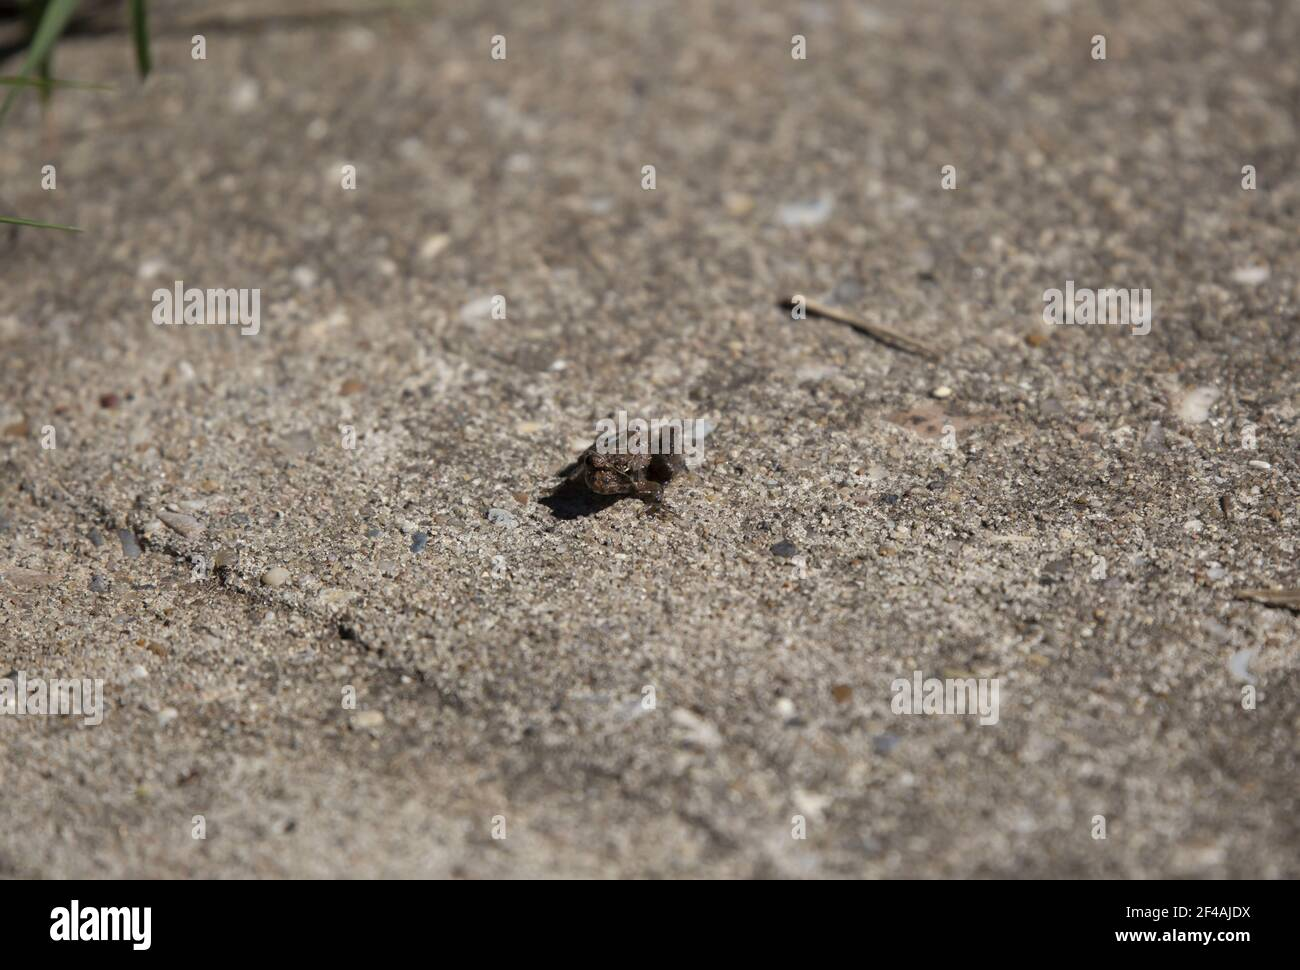 Tiny, young brown Strecker's Chorus Frog (Pseudacris streckeri) on a cement sidewalk Stock Photo